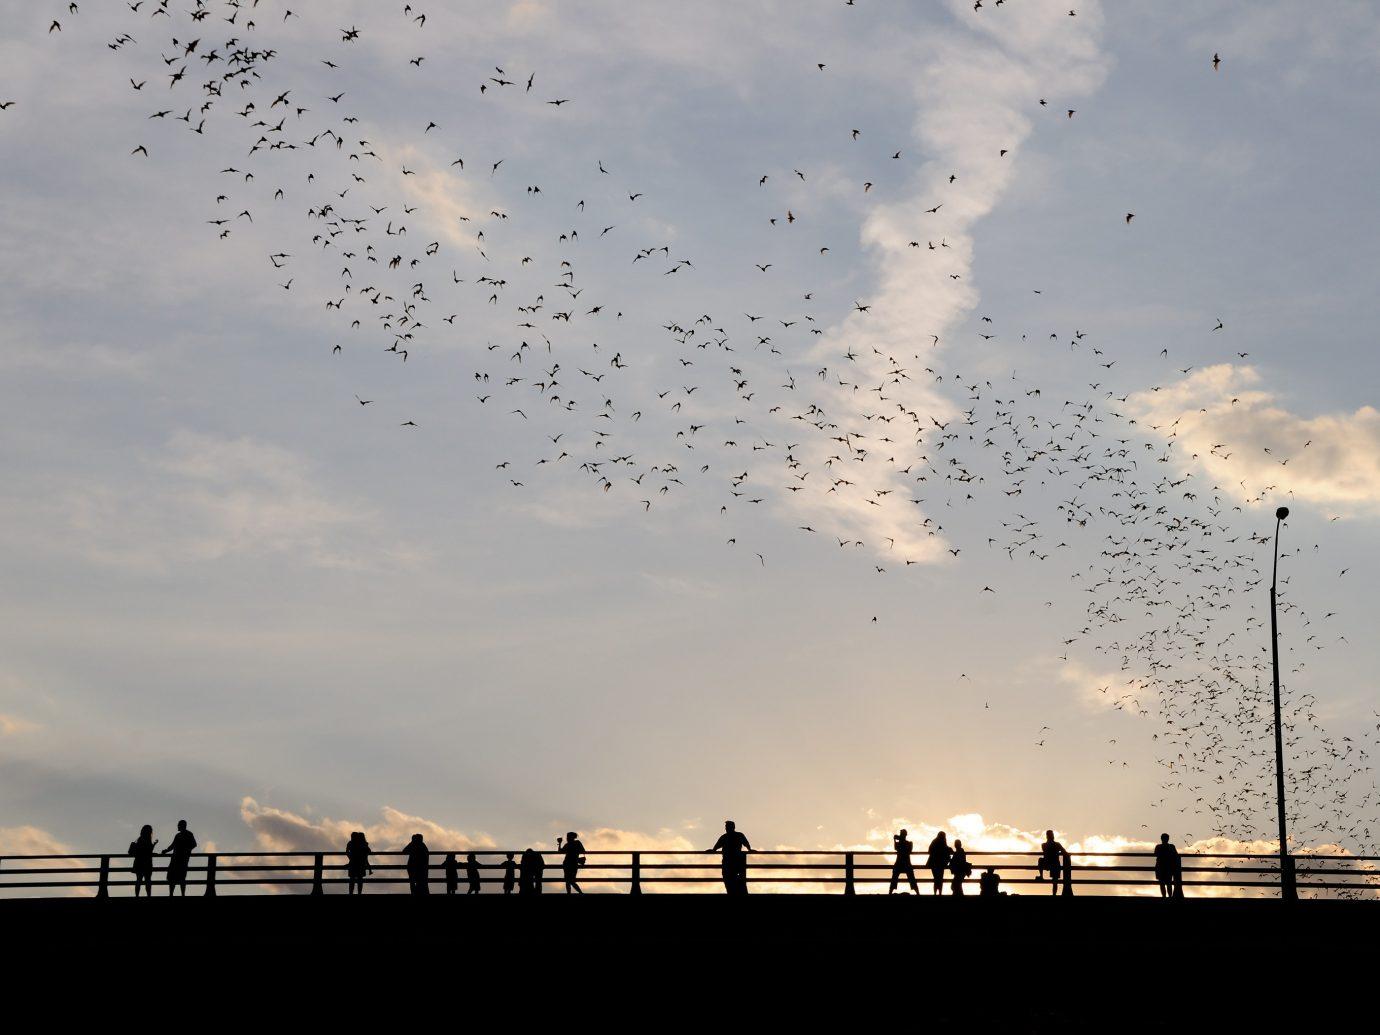 Trip Ideas sky flying outdoor flock cloud horizon morning dawn evening dusk sunlight Sunset bird migration animal migration day